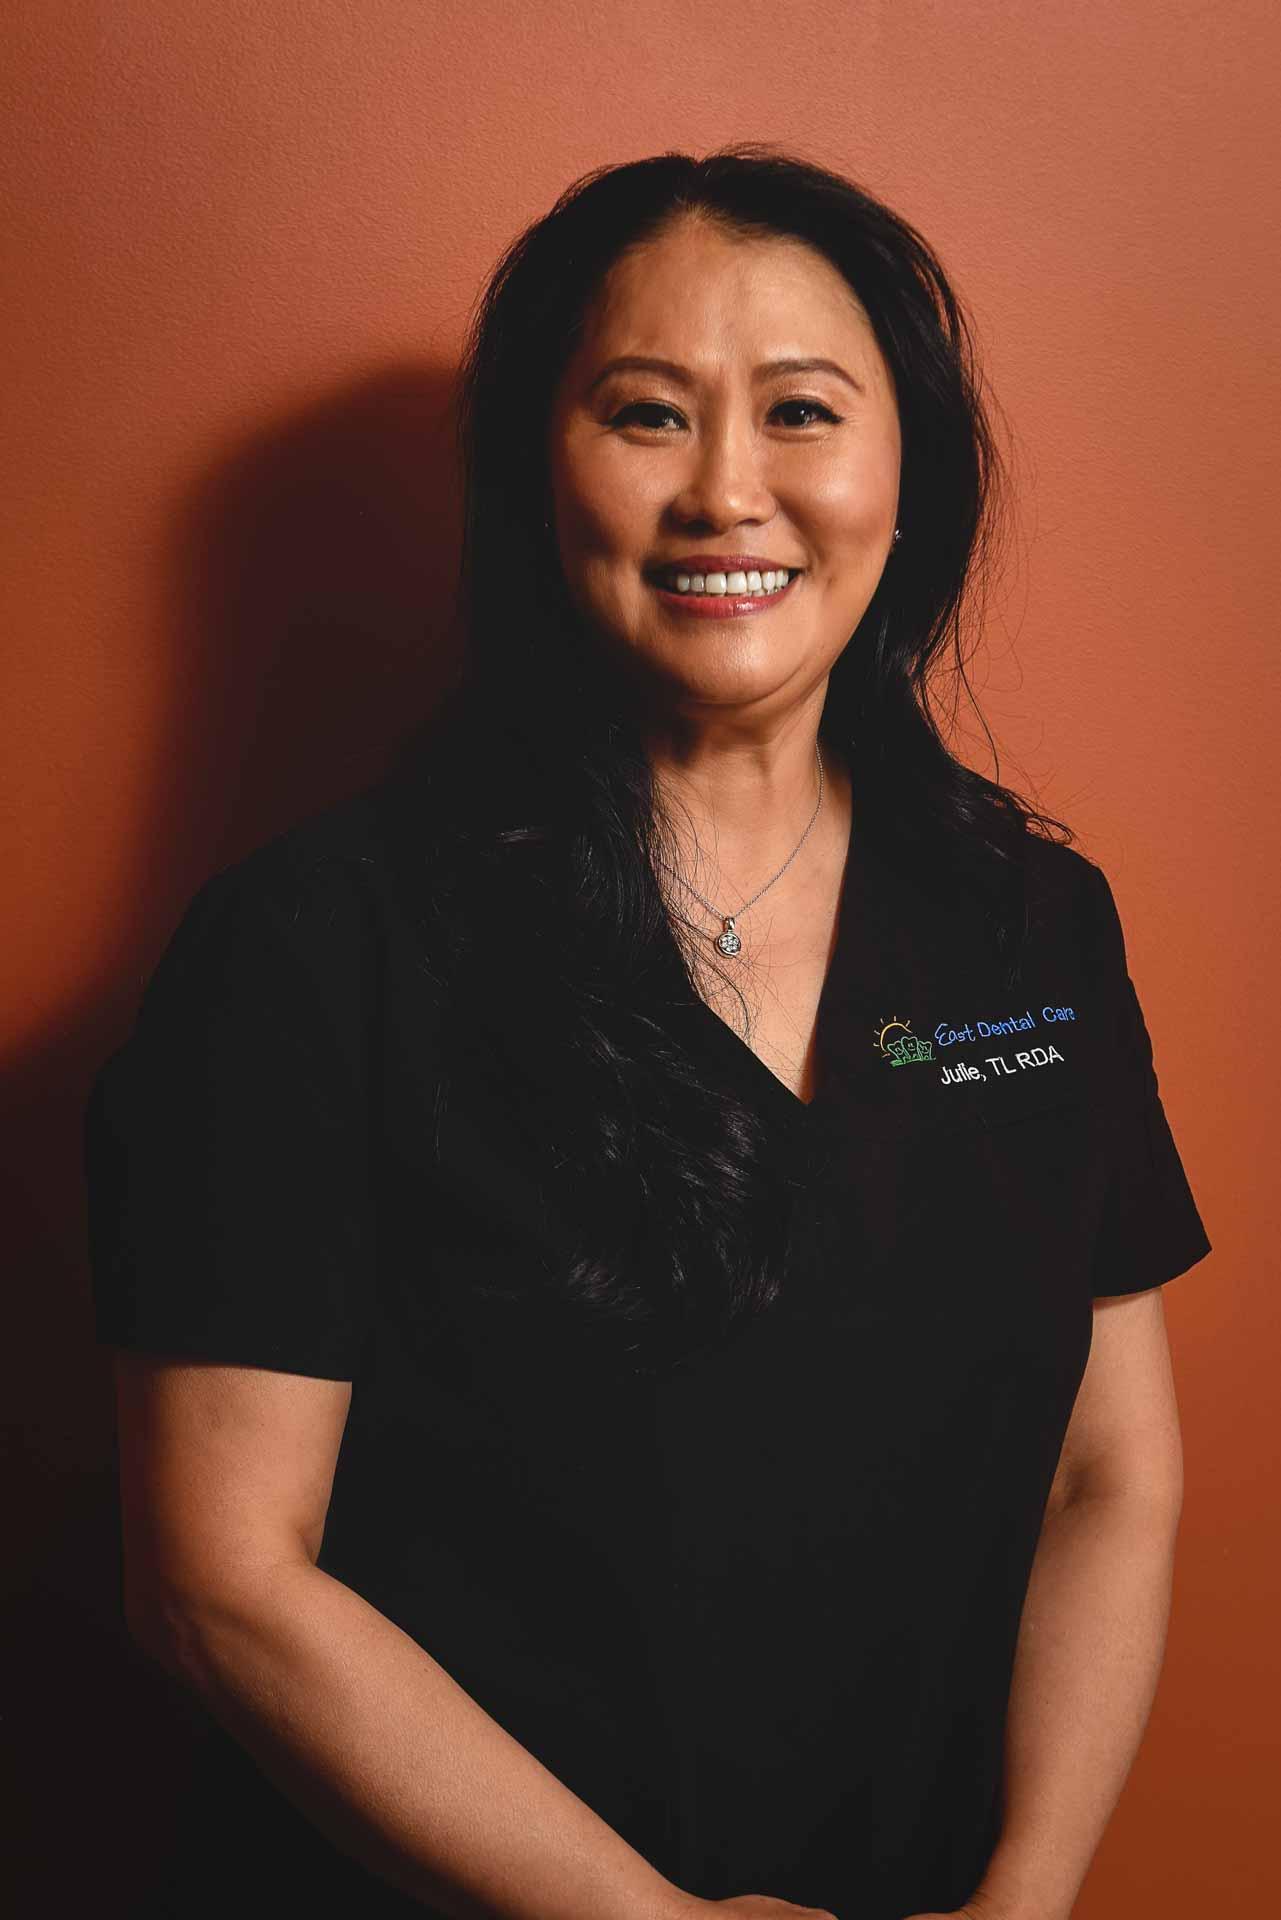 Julie | East Dental Care | SE Calgary Dentist | RDA